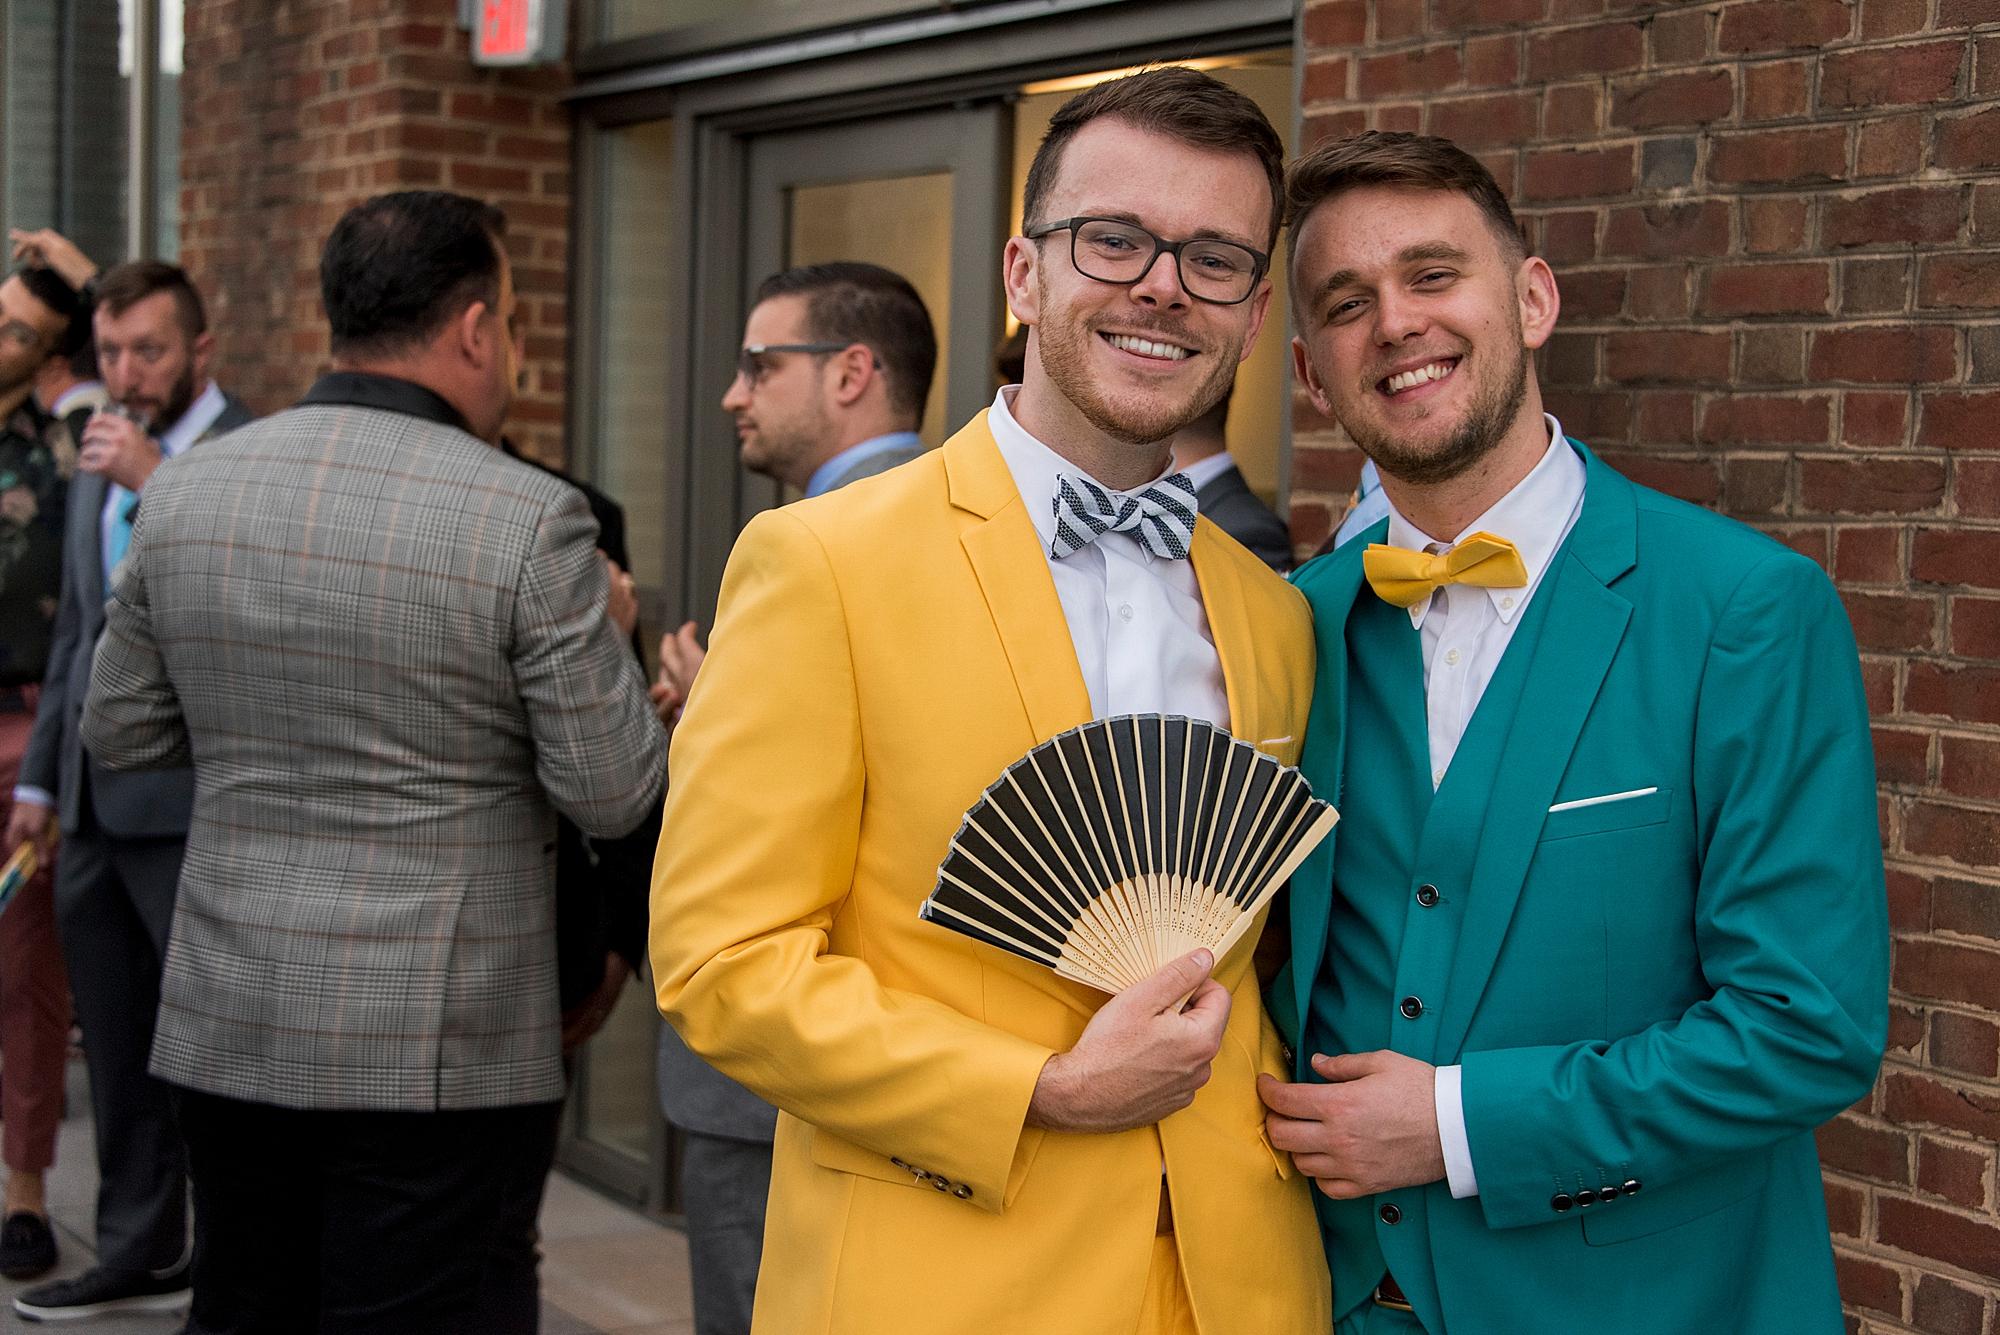 Dan_and_Byron_Love_by_Joe_Mac_Philadelphia_Wedding_LGBTQ_Photography_Gay_Independence_visitor_Center_110.JPG